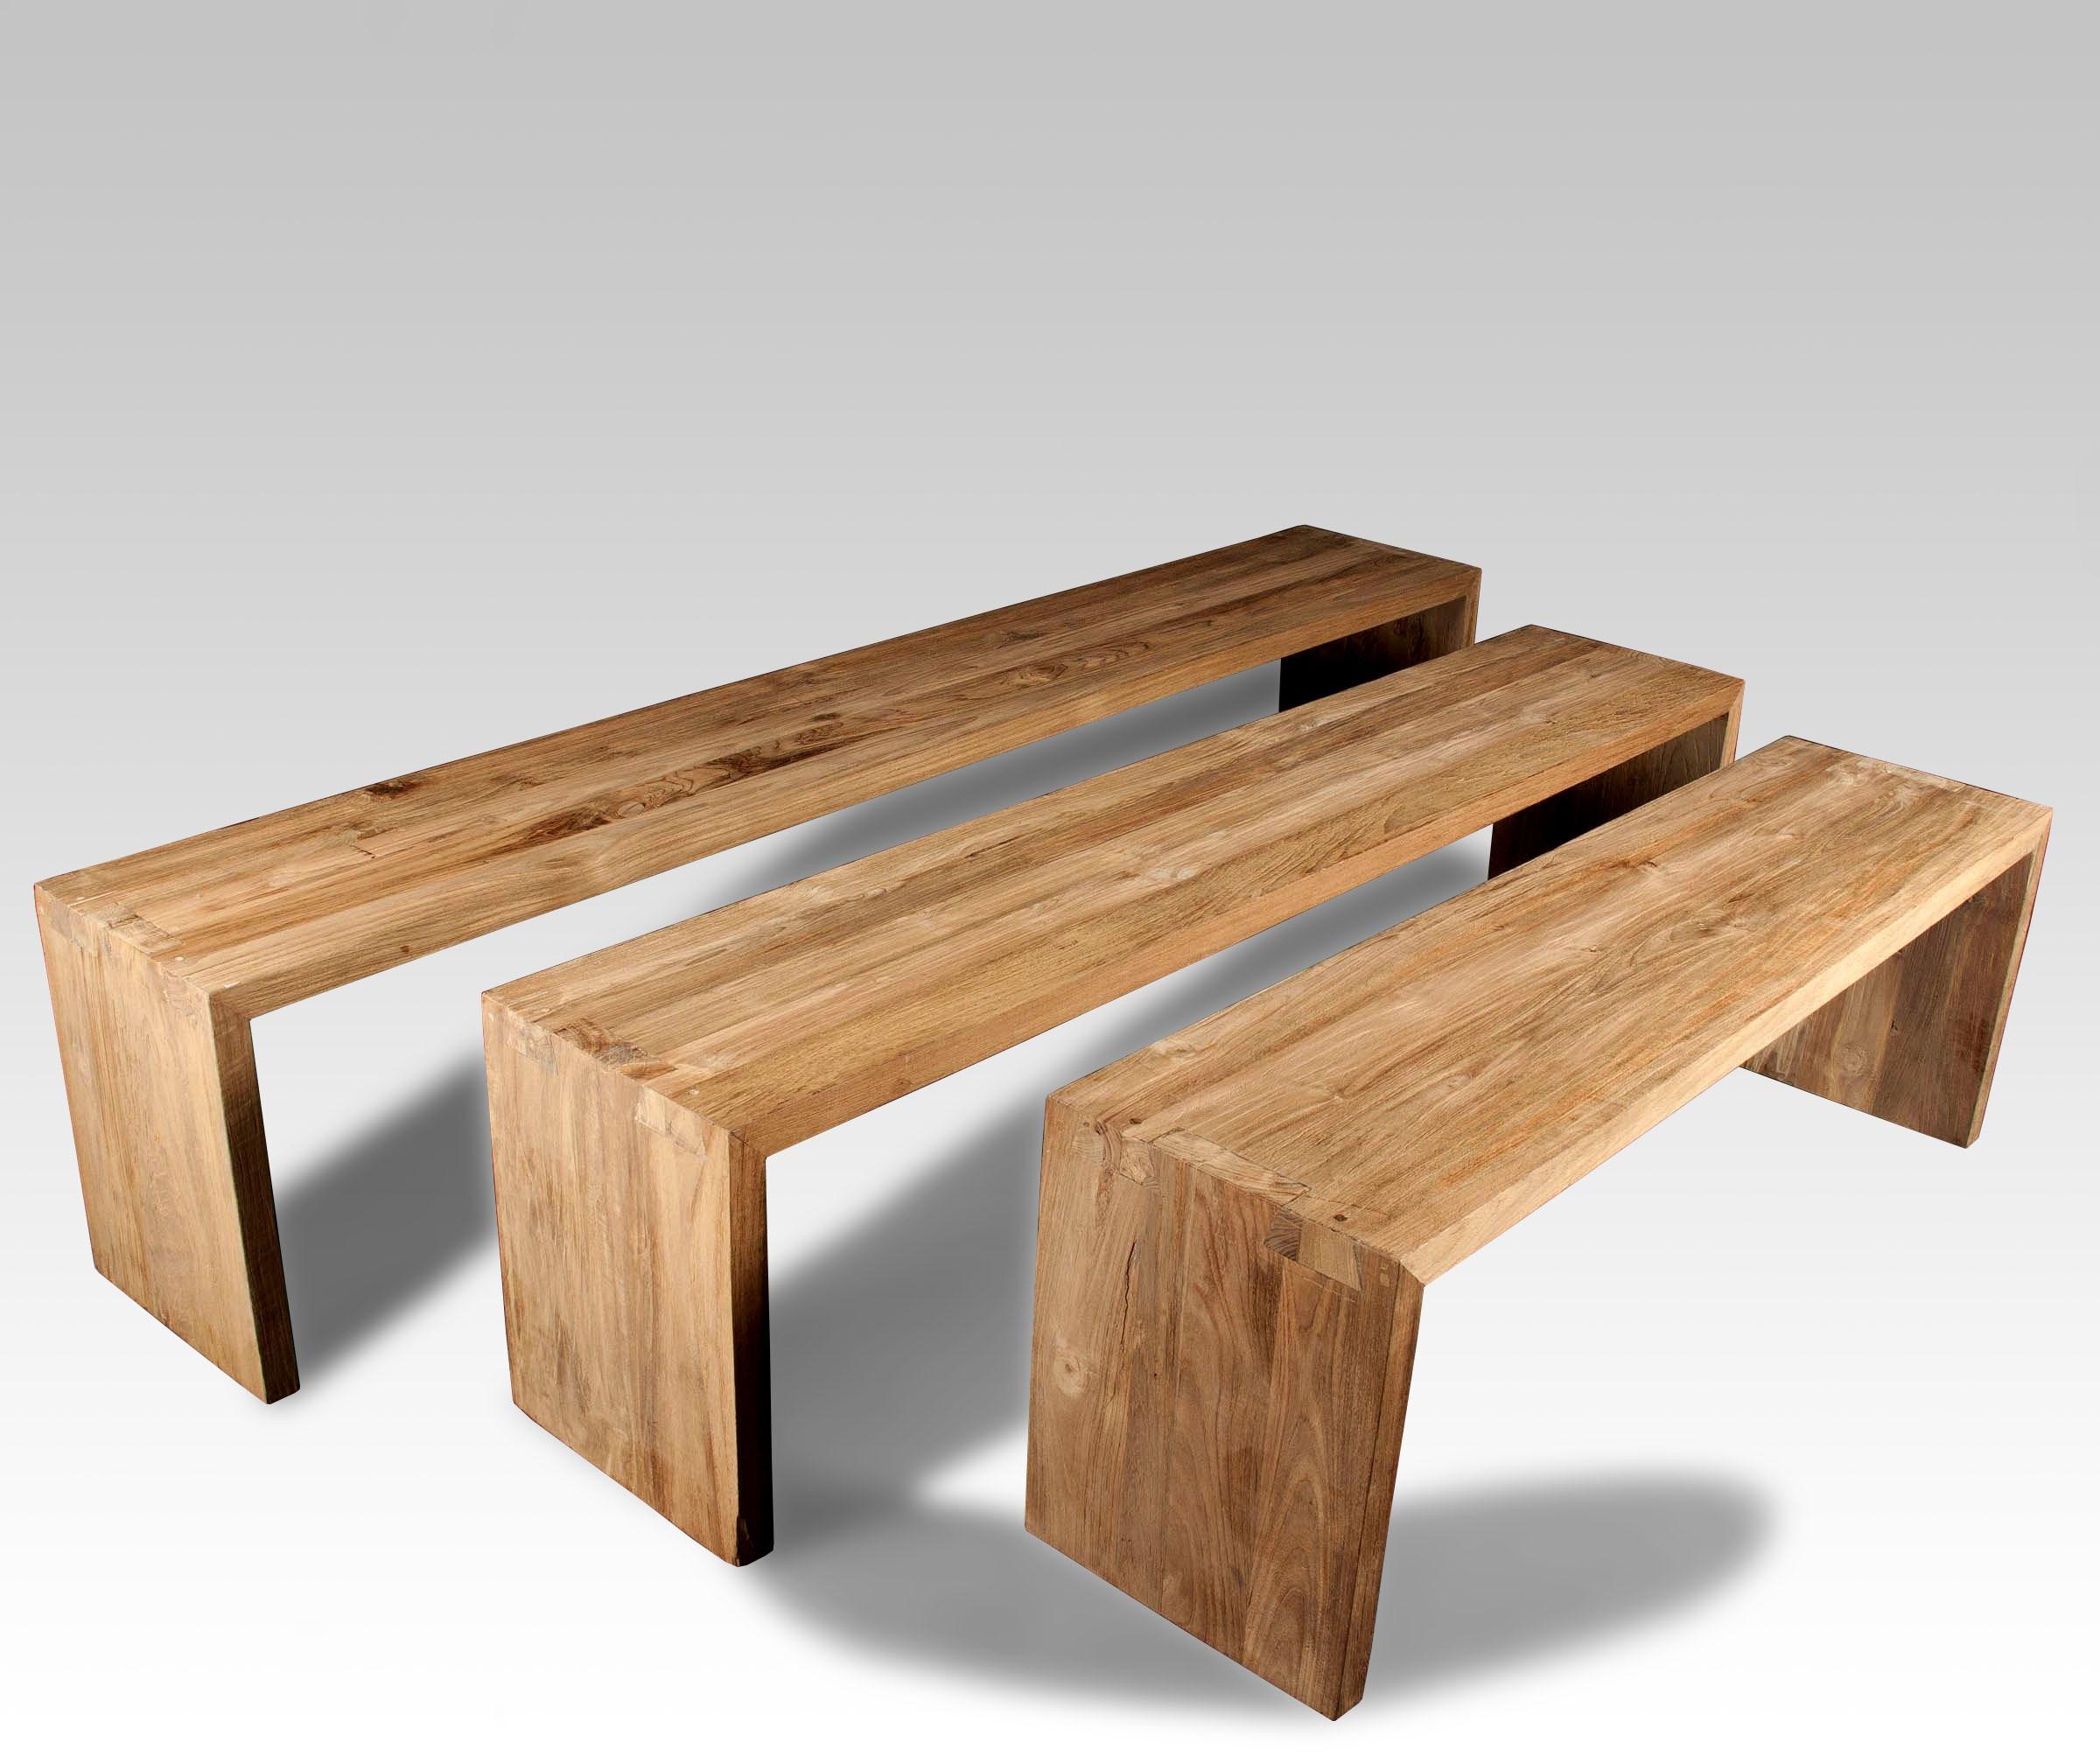 Bancos y bancos de madera batavia - Bancos madera exterior ...